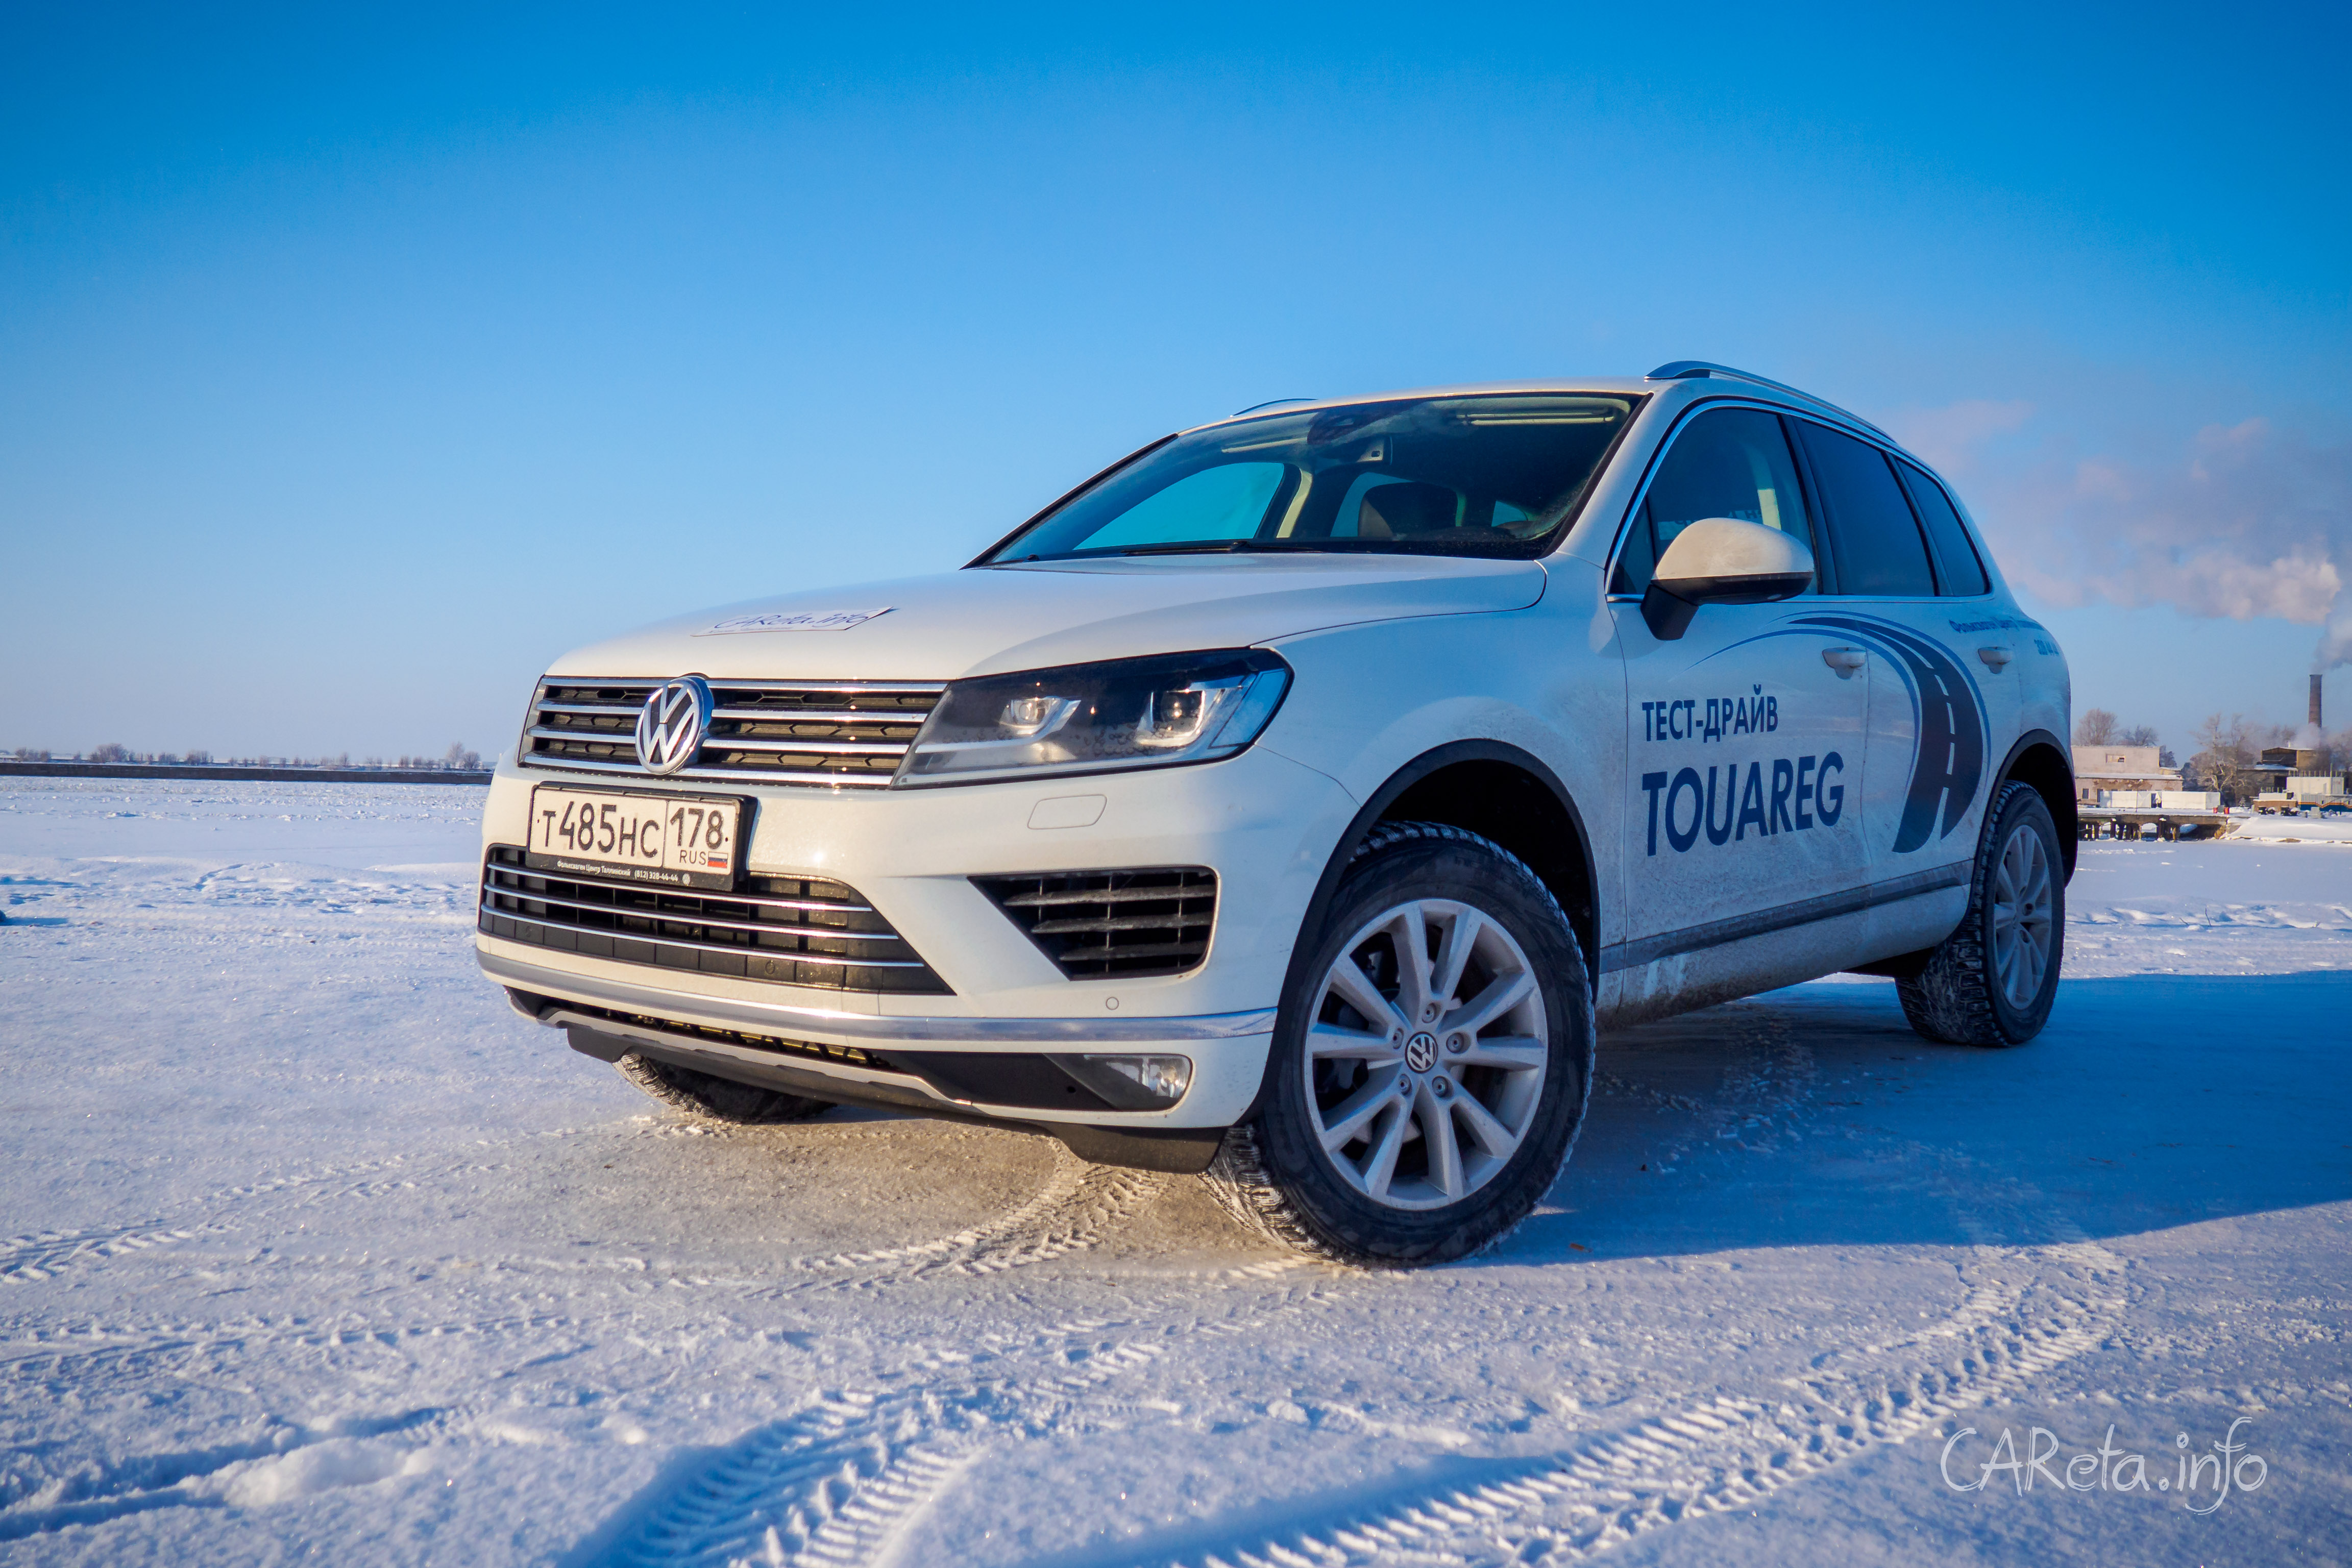 У VW Touareg не осталось русских корней